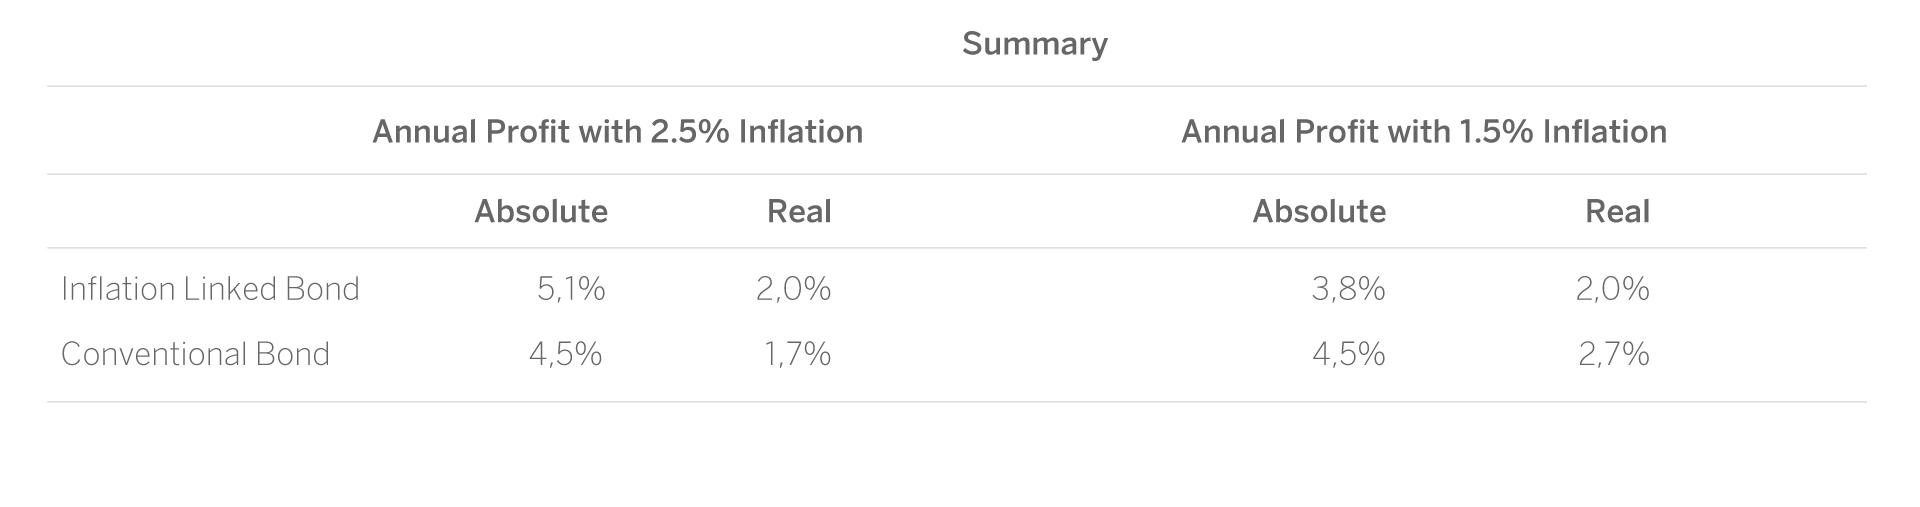 BONDS - INFLATION